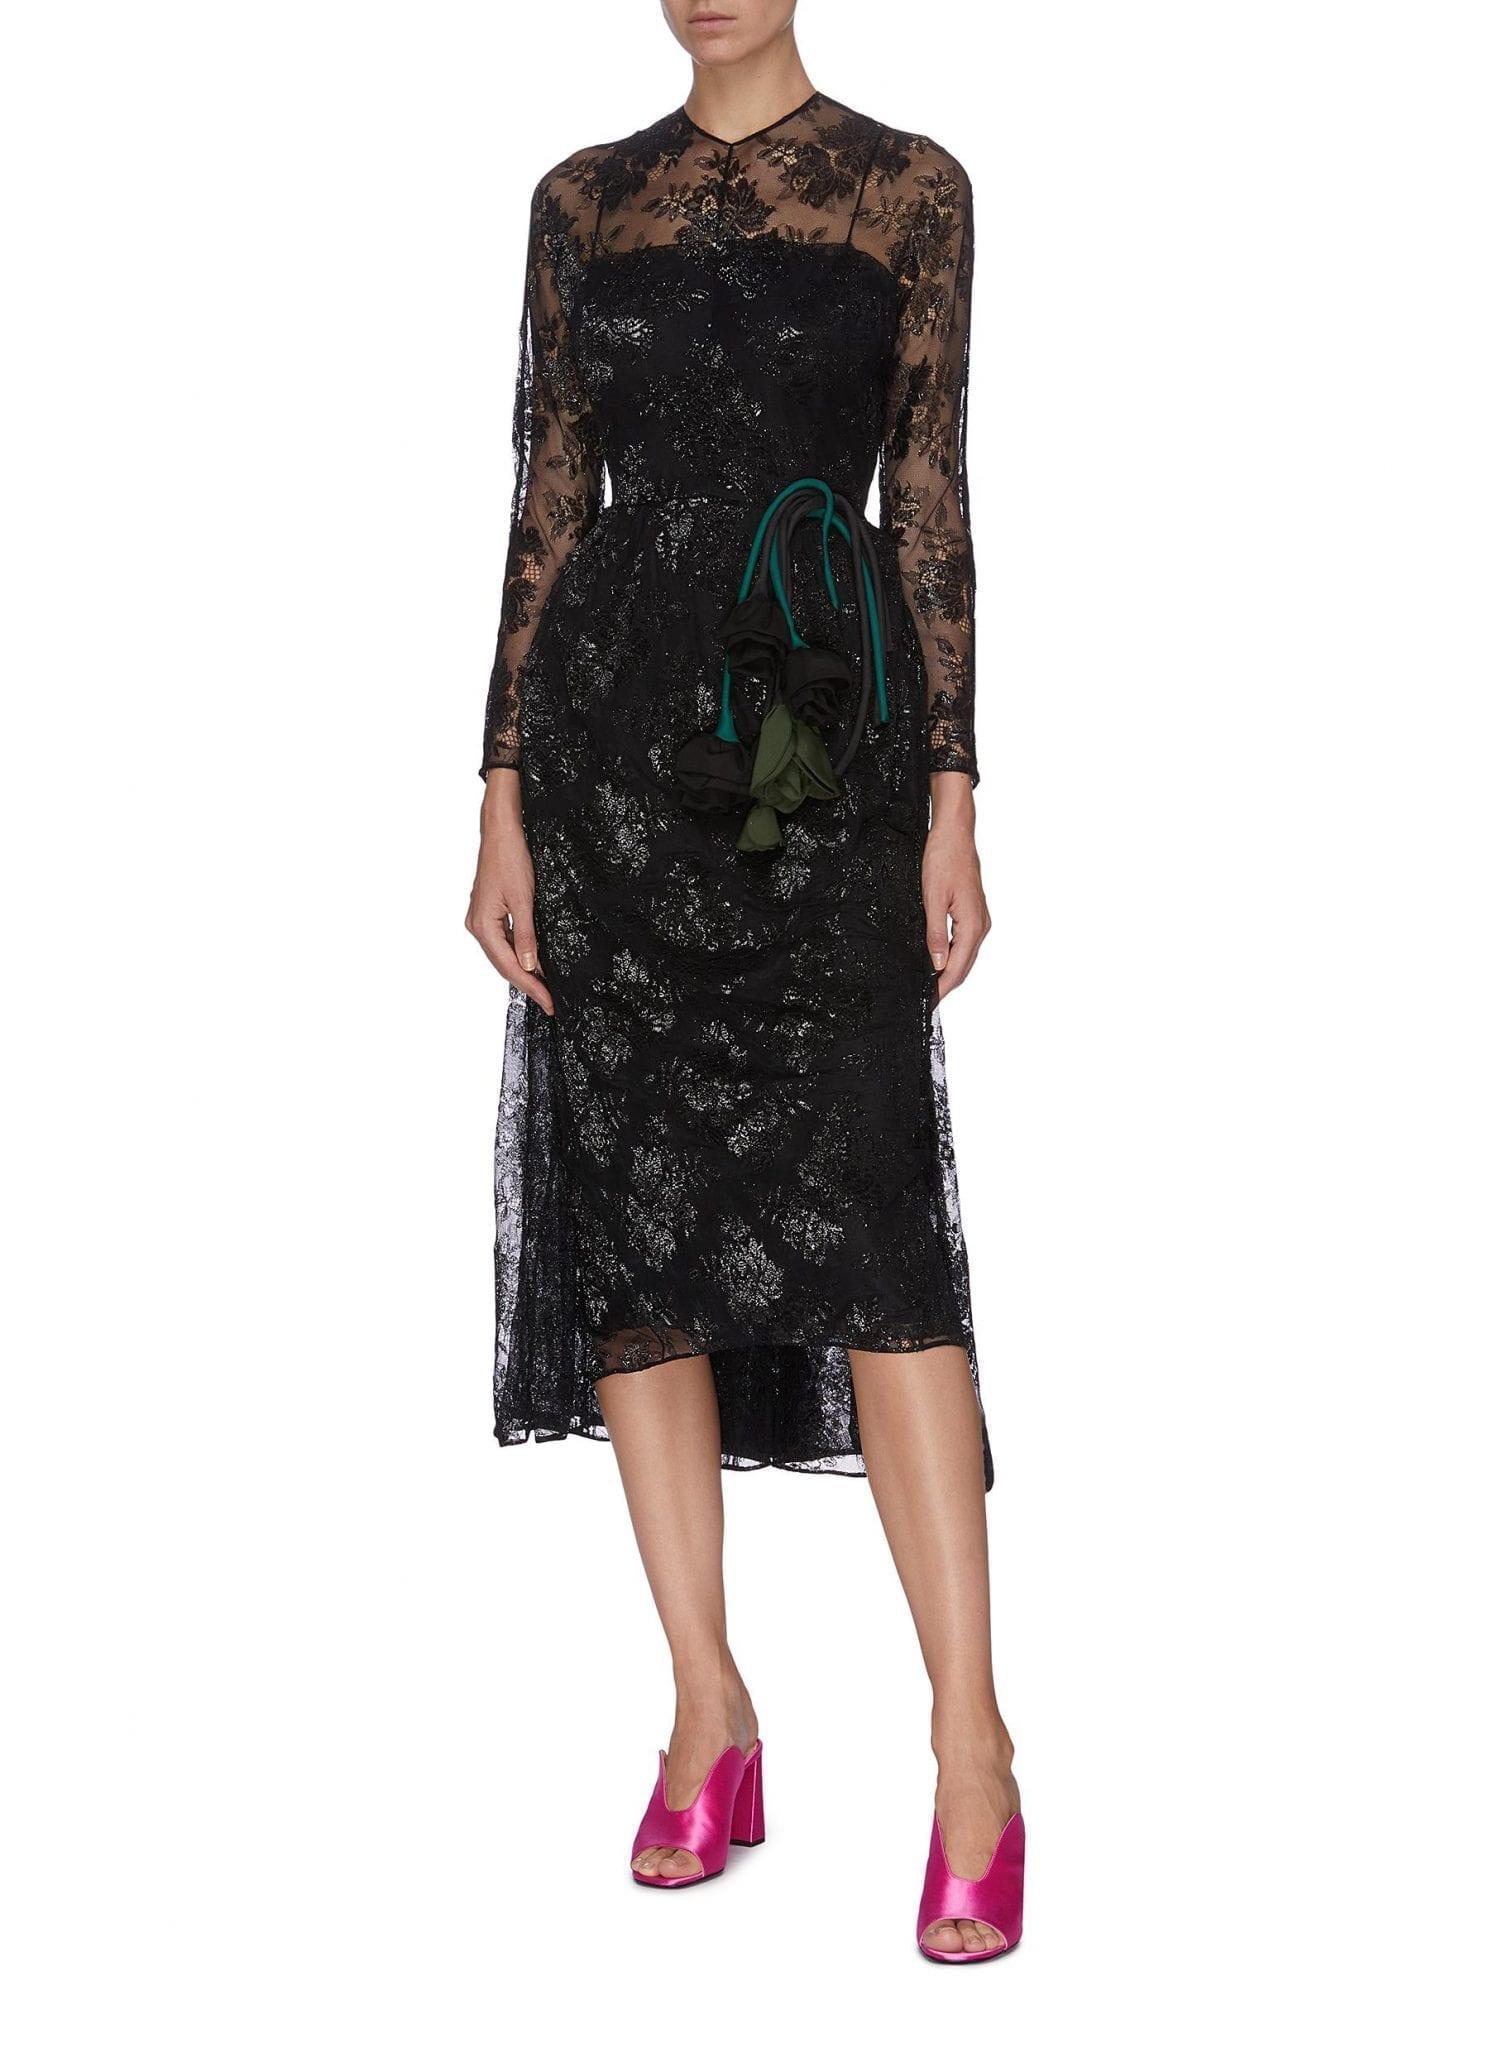 PRADA Floral Motif Embroidered Sheer Lace Dress